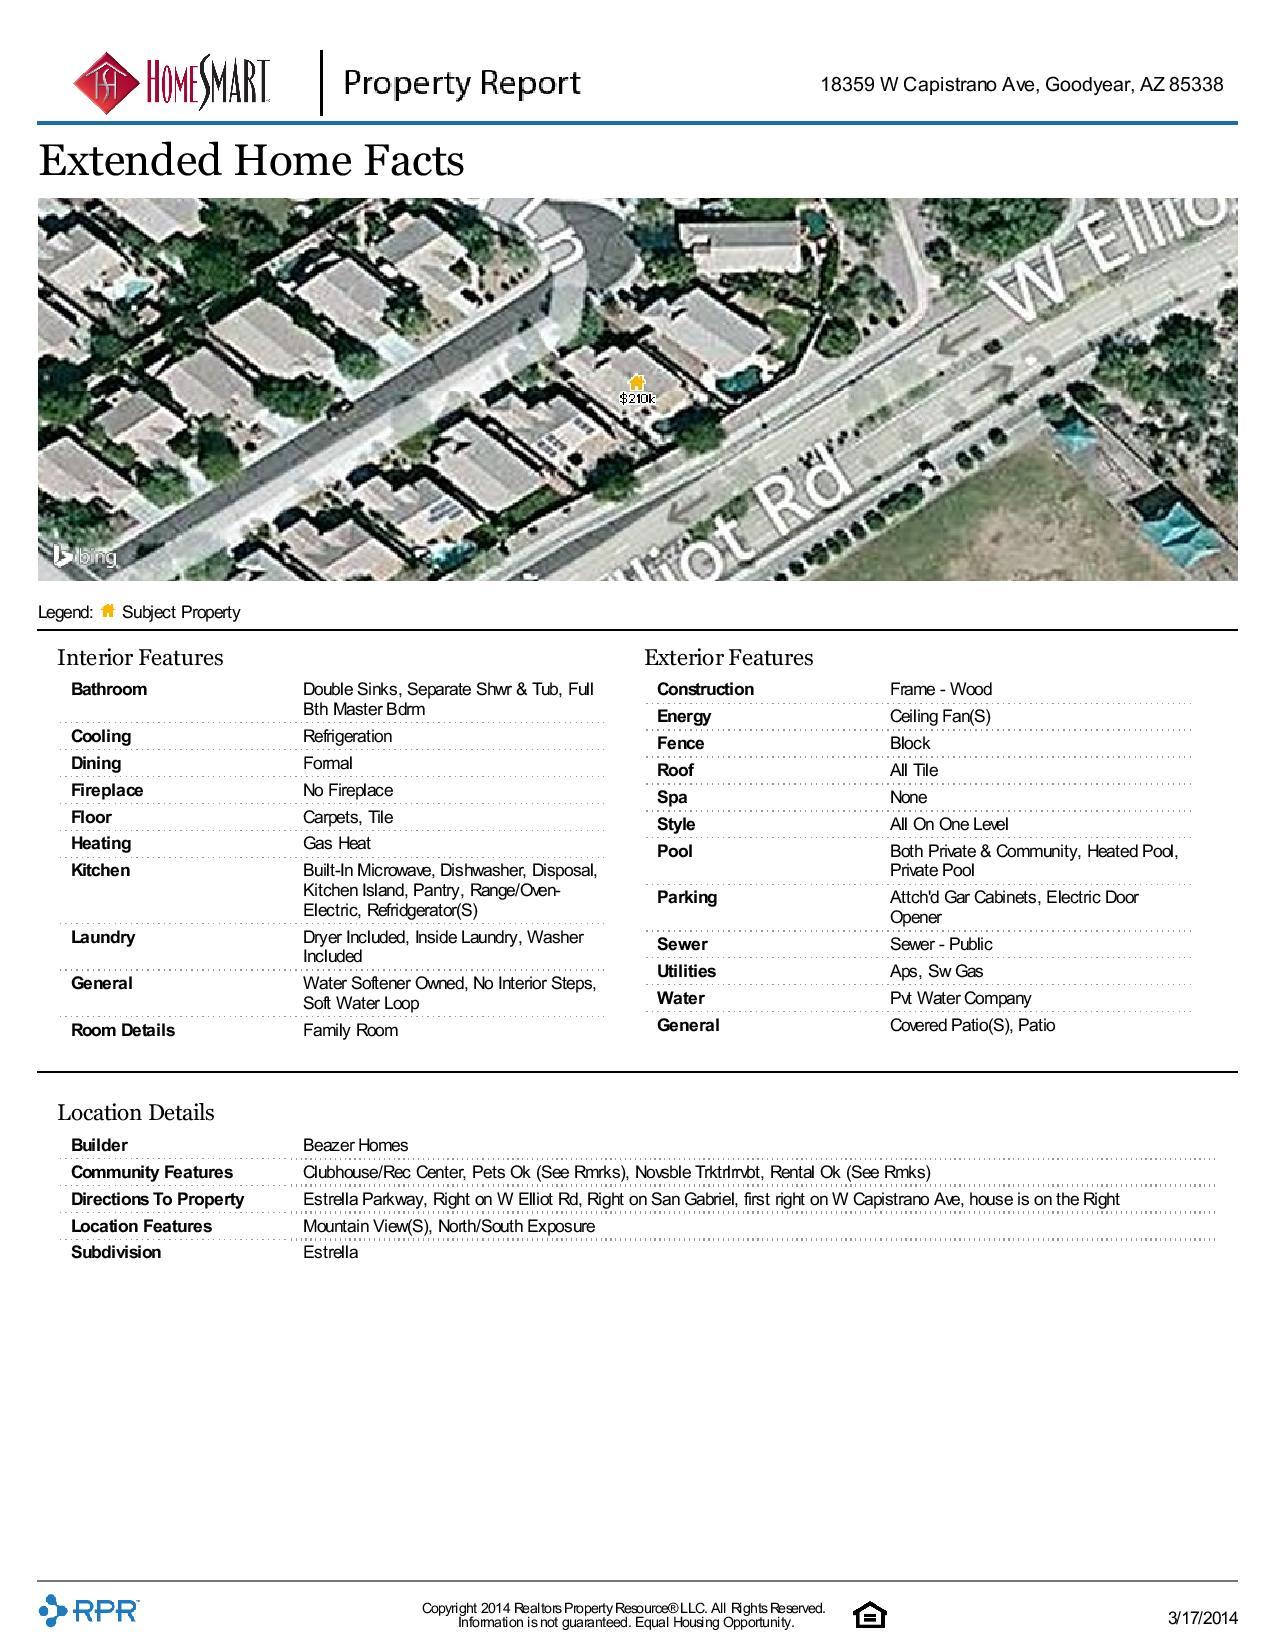 18359-W-Capistrano-Ave-Goodyear-AZ-85338-page-004